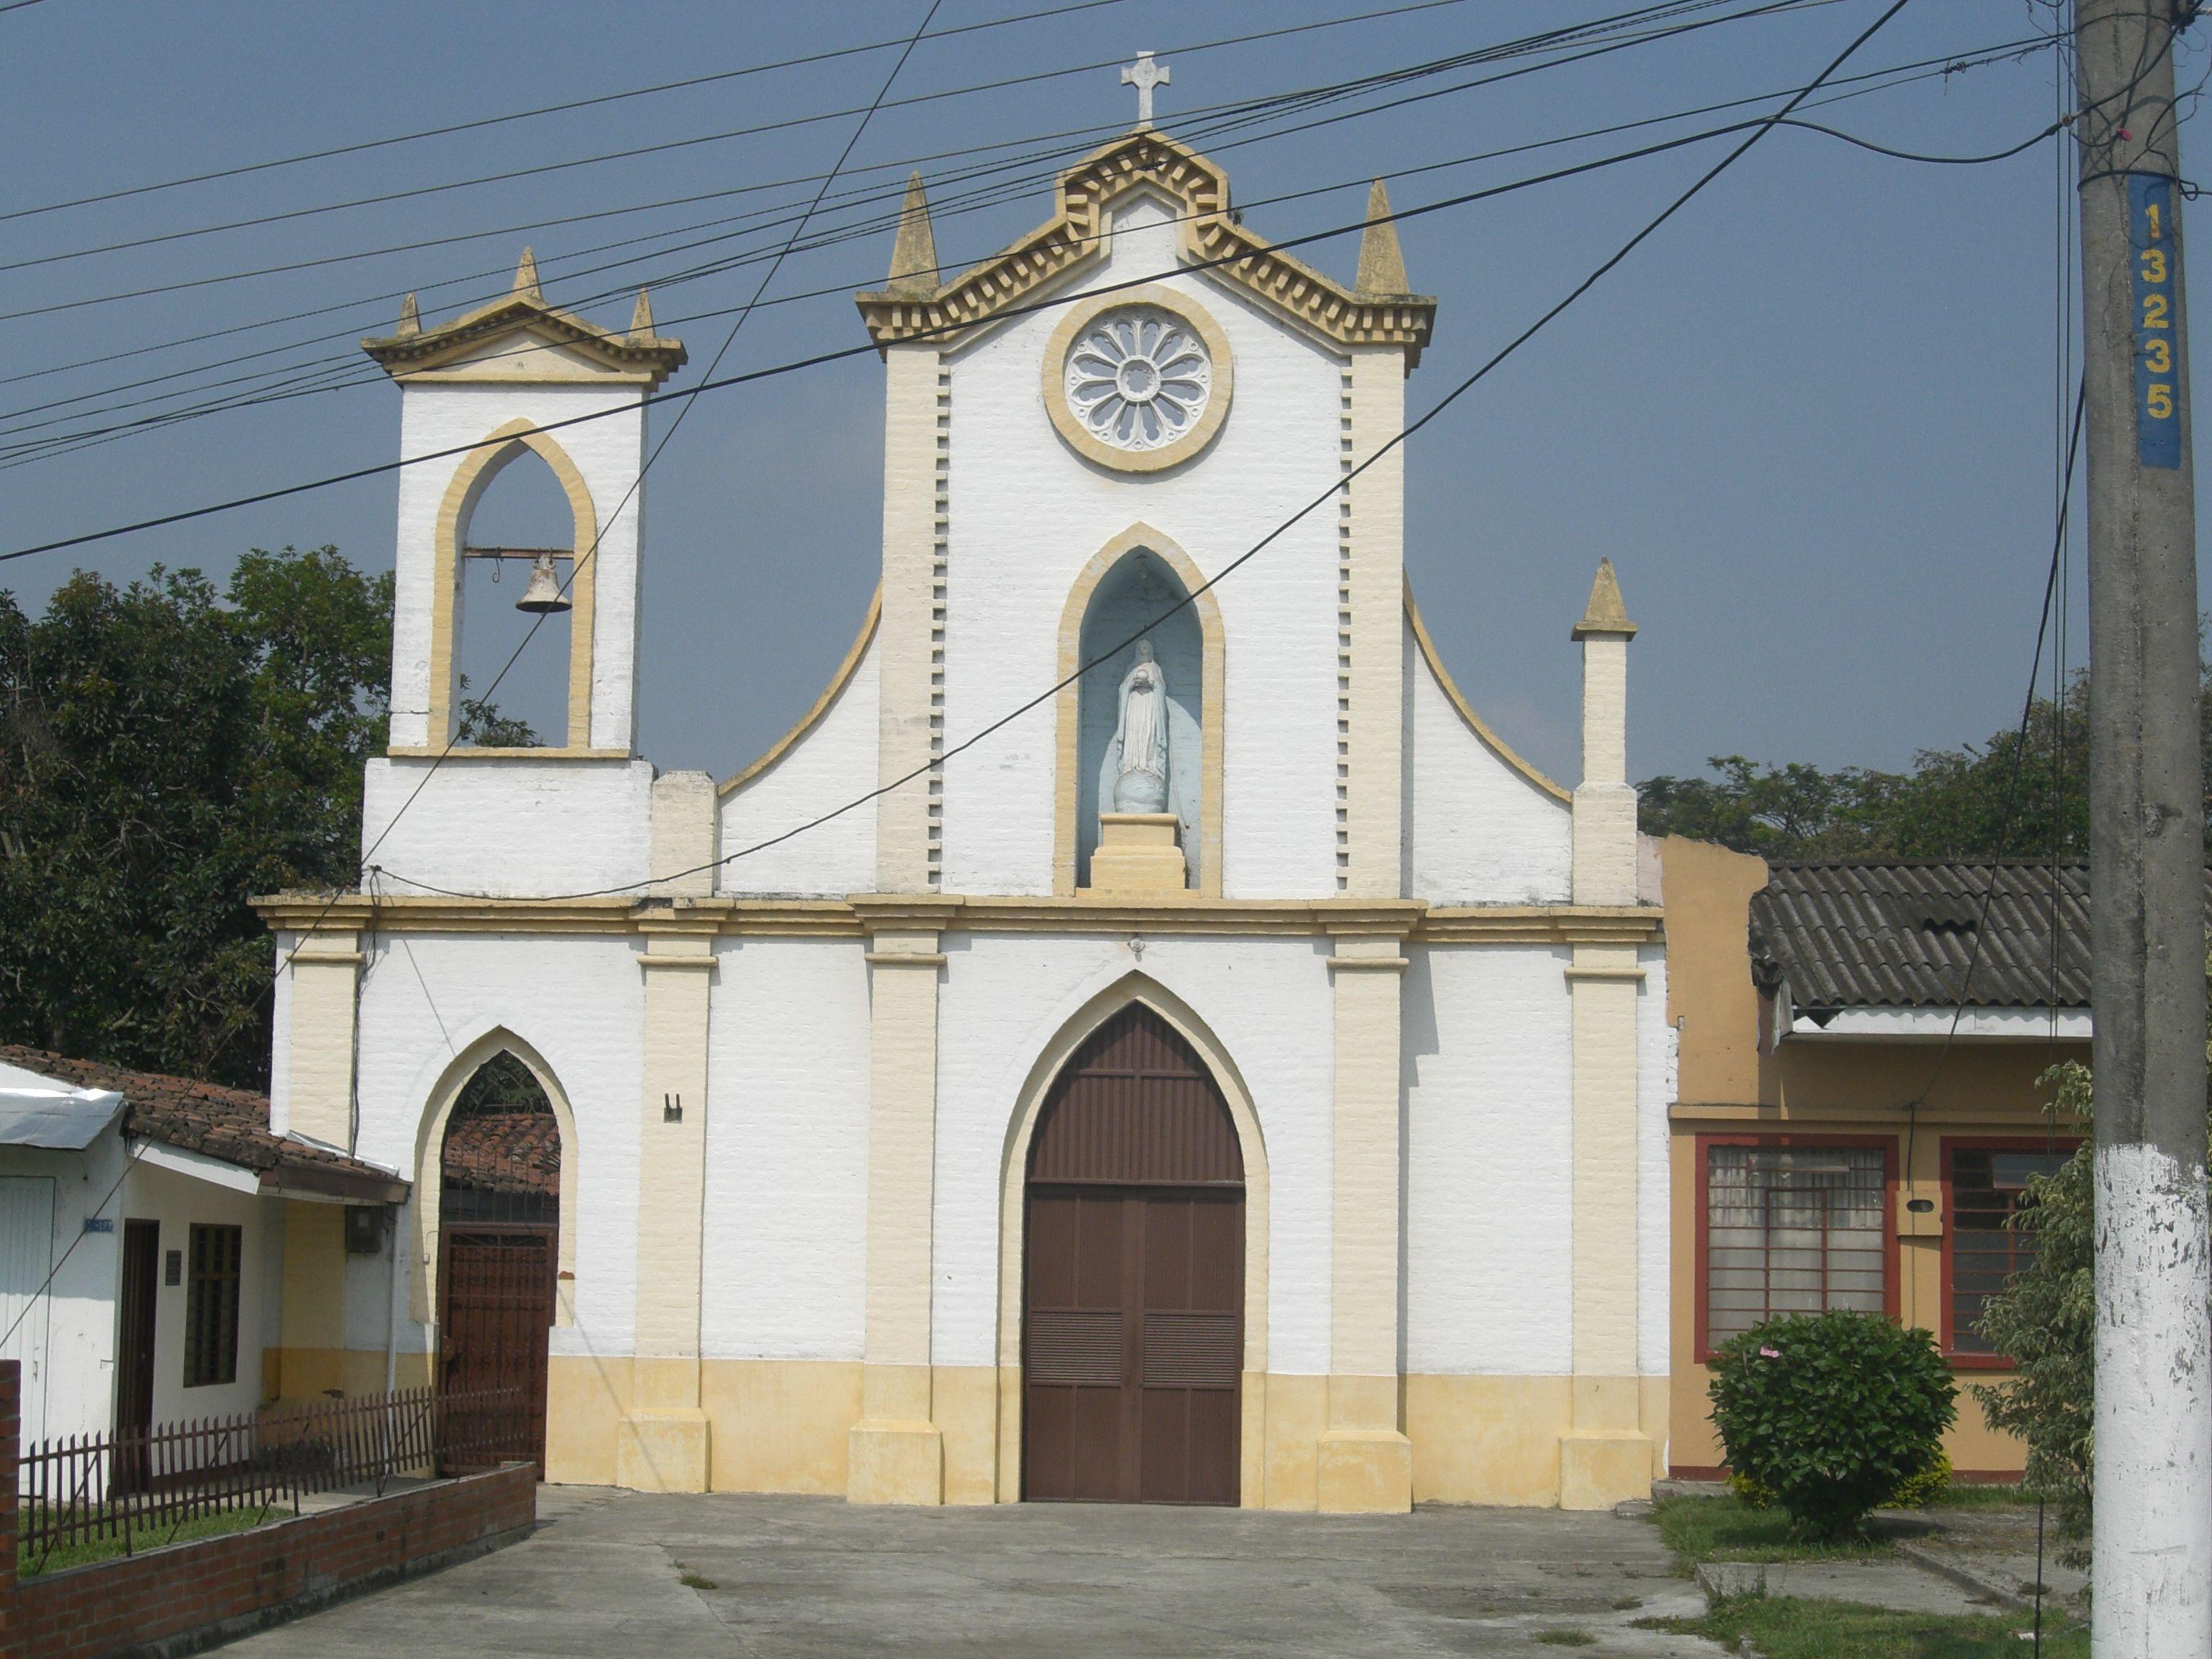 Iglesia de El Bolo, Palmira, Valle, Colombia. Año 2010.